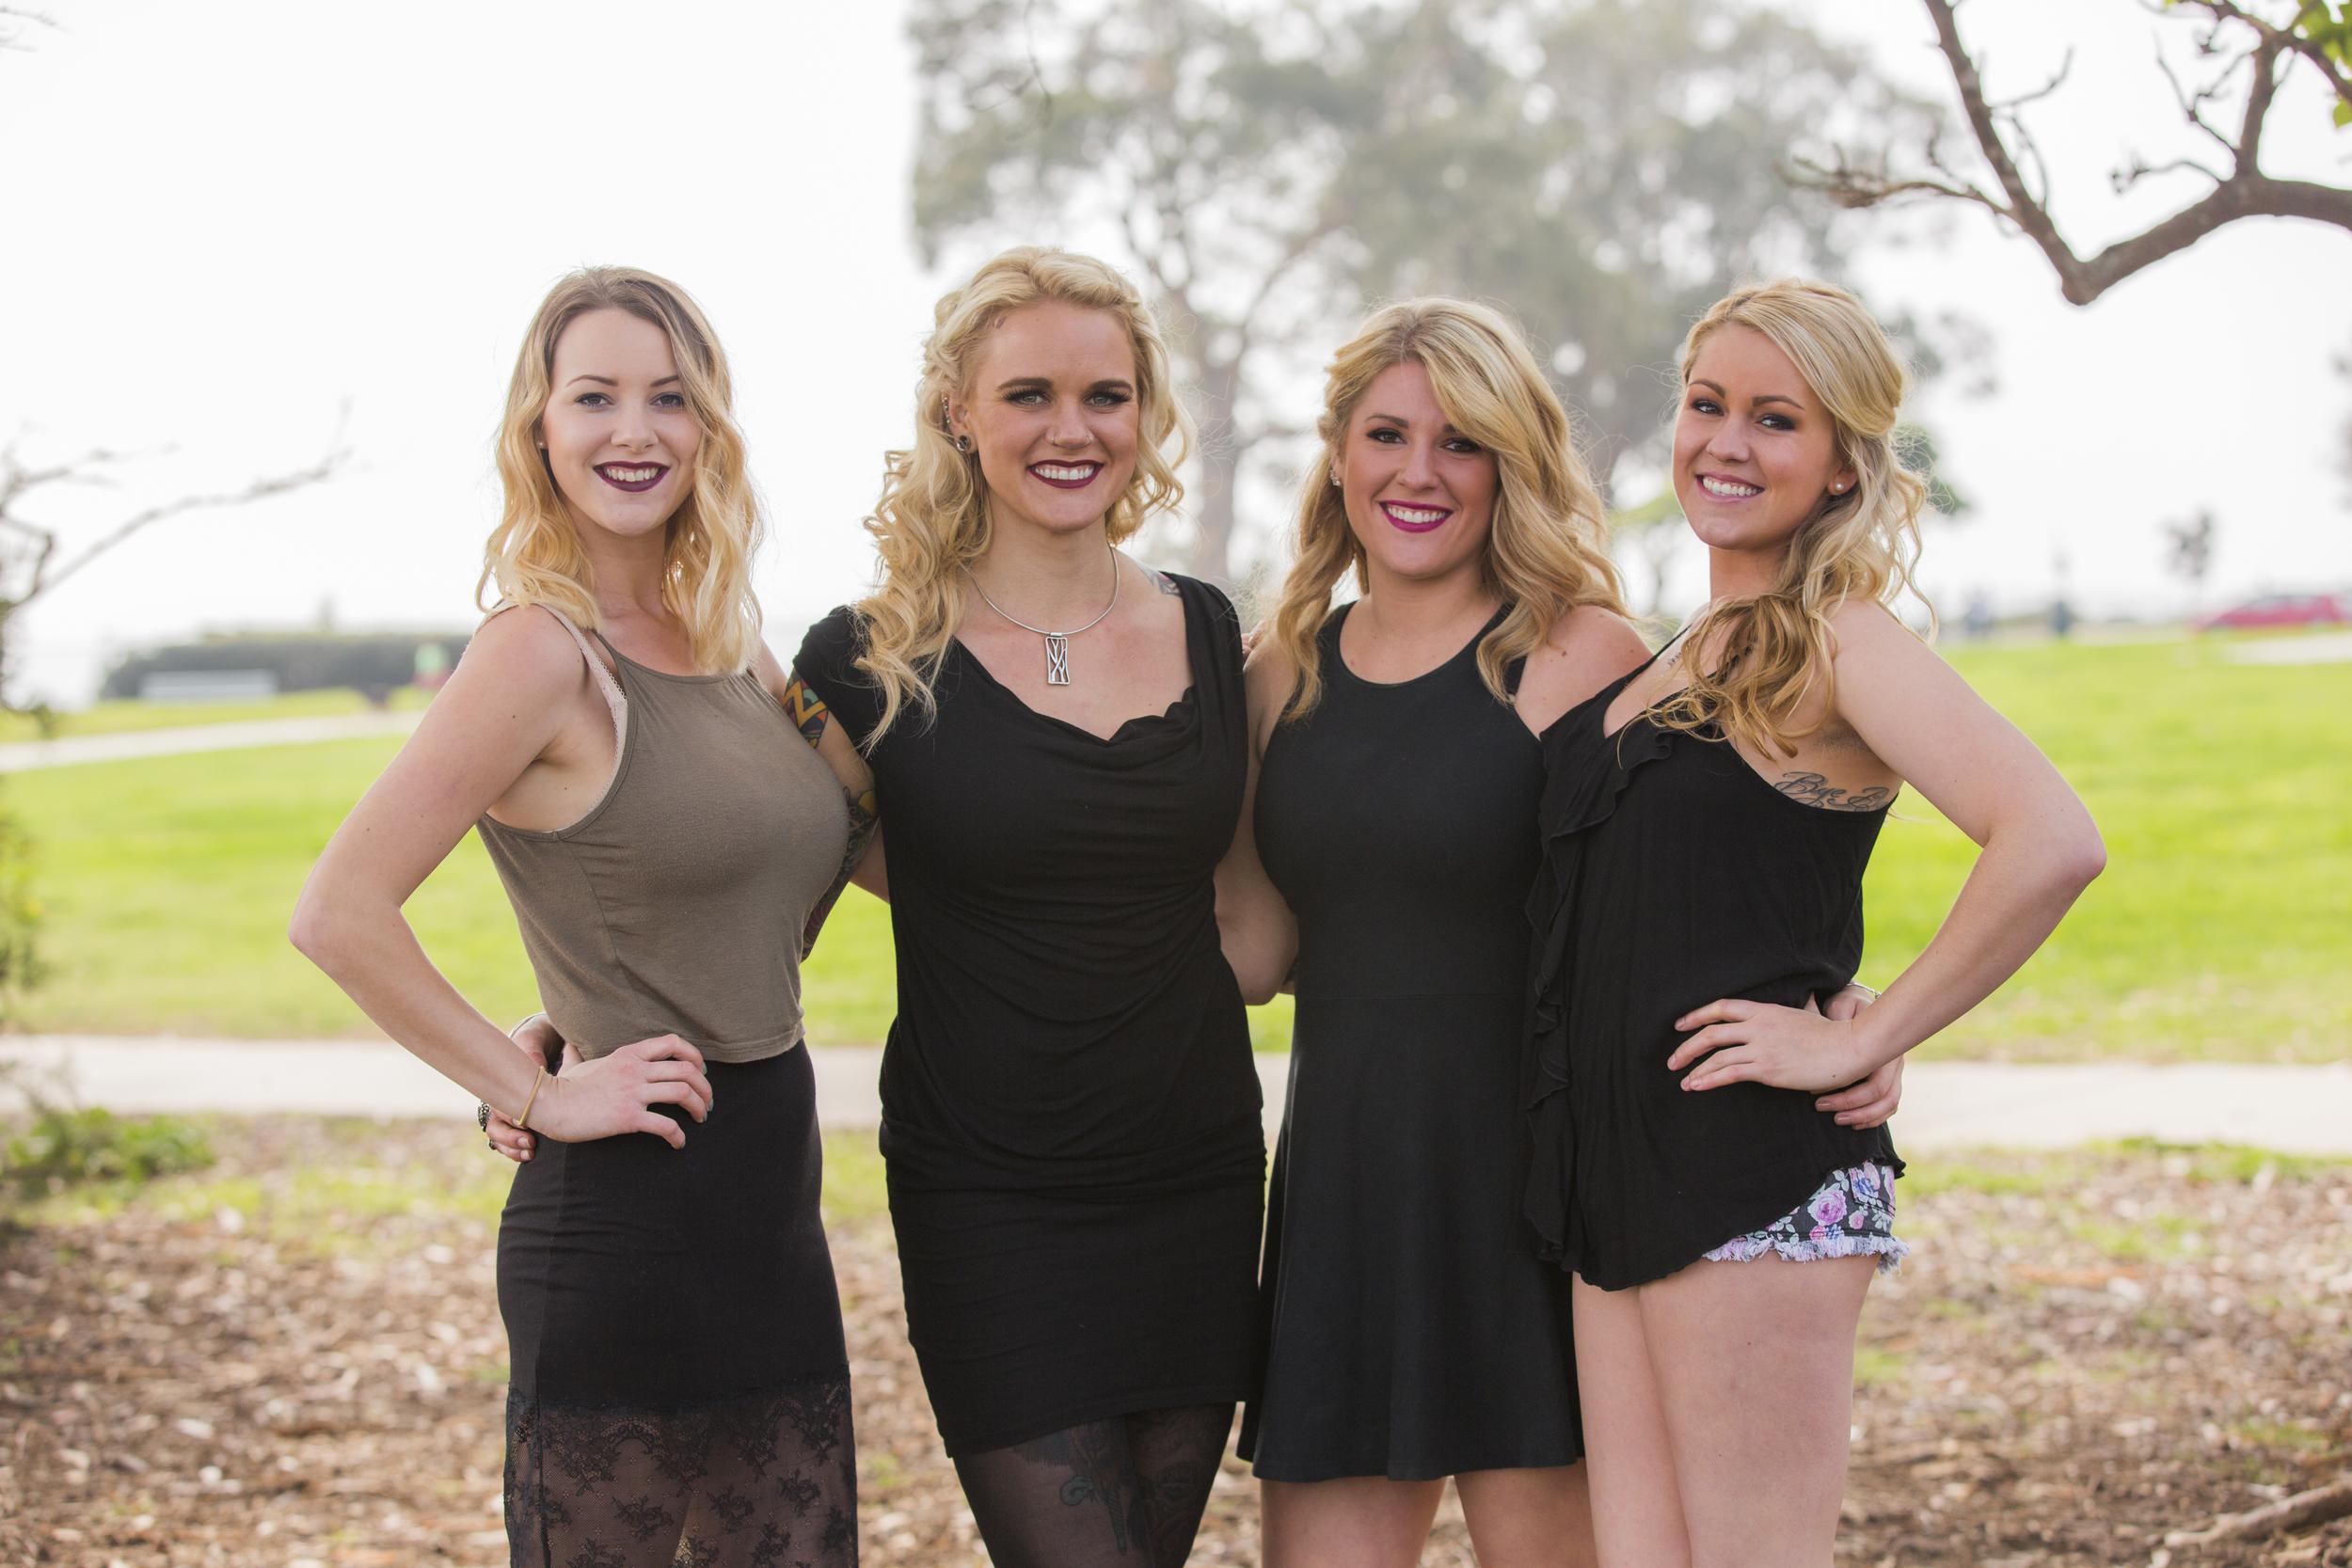 Blondes2.jpg